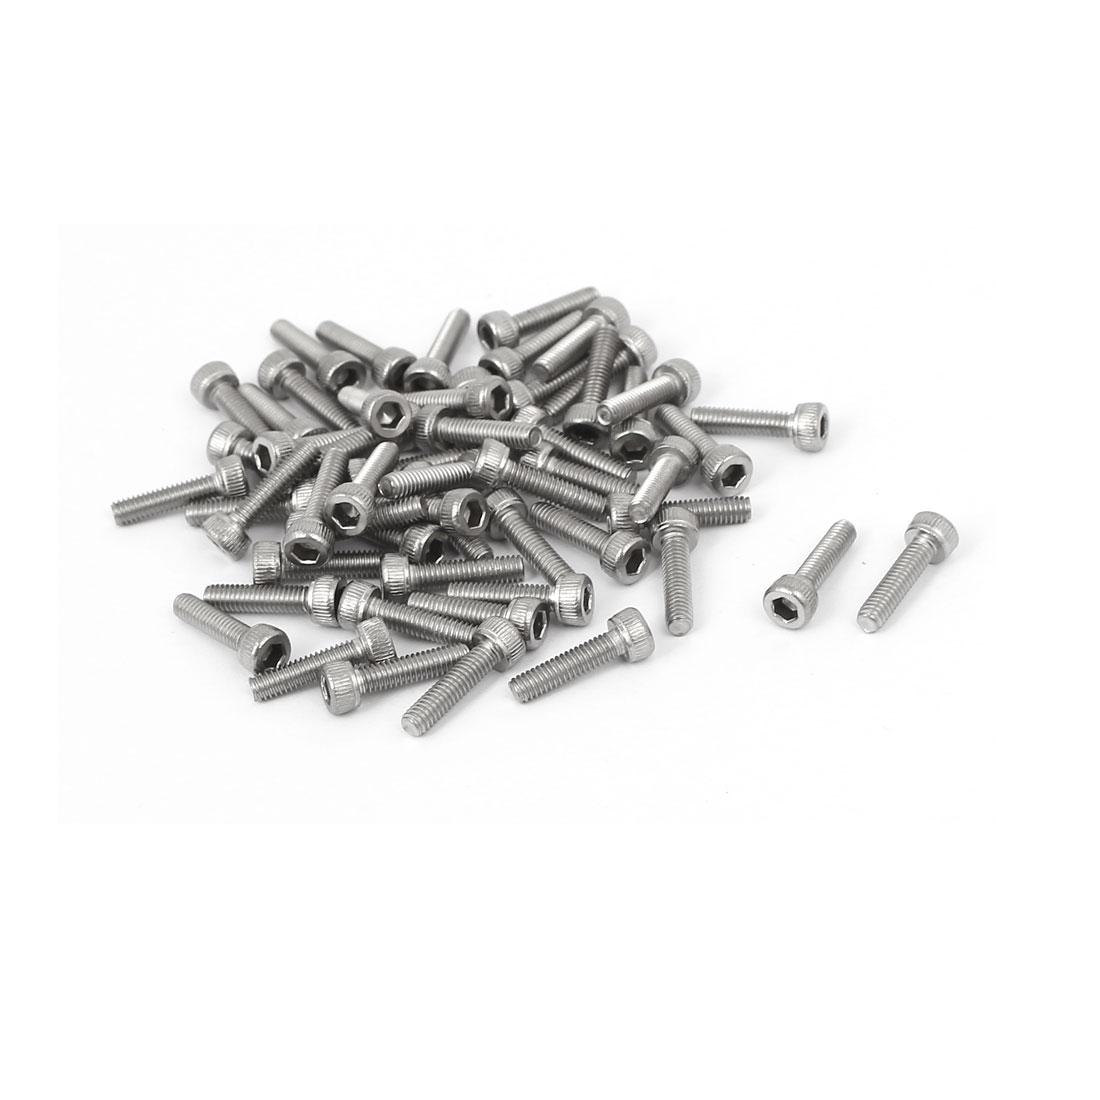 M2.5 x 10mm Thread 304 Stainless Steel Hex Socket Head Cap Screw DIN912 55pcs